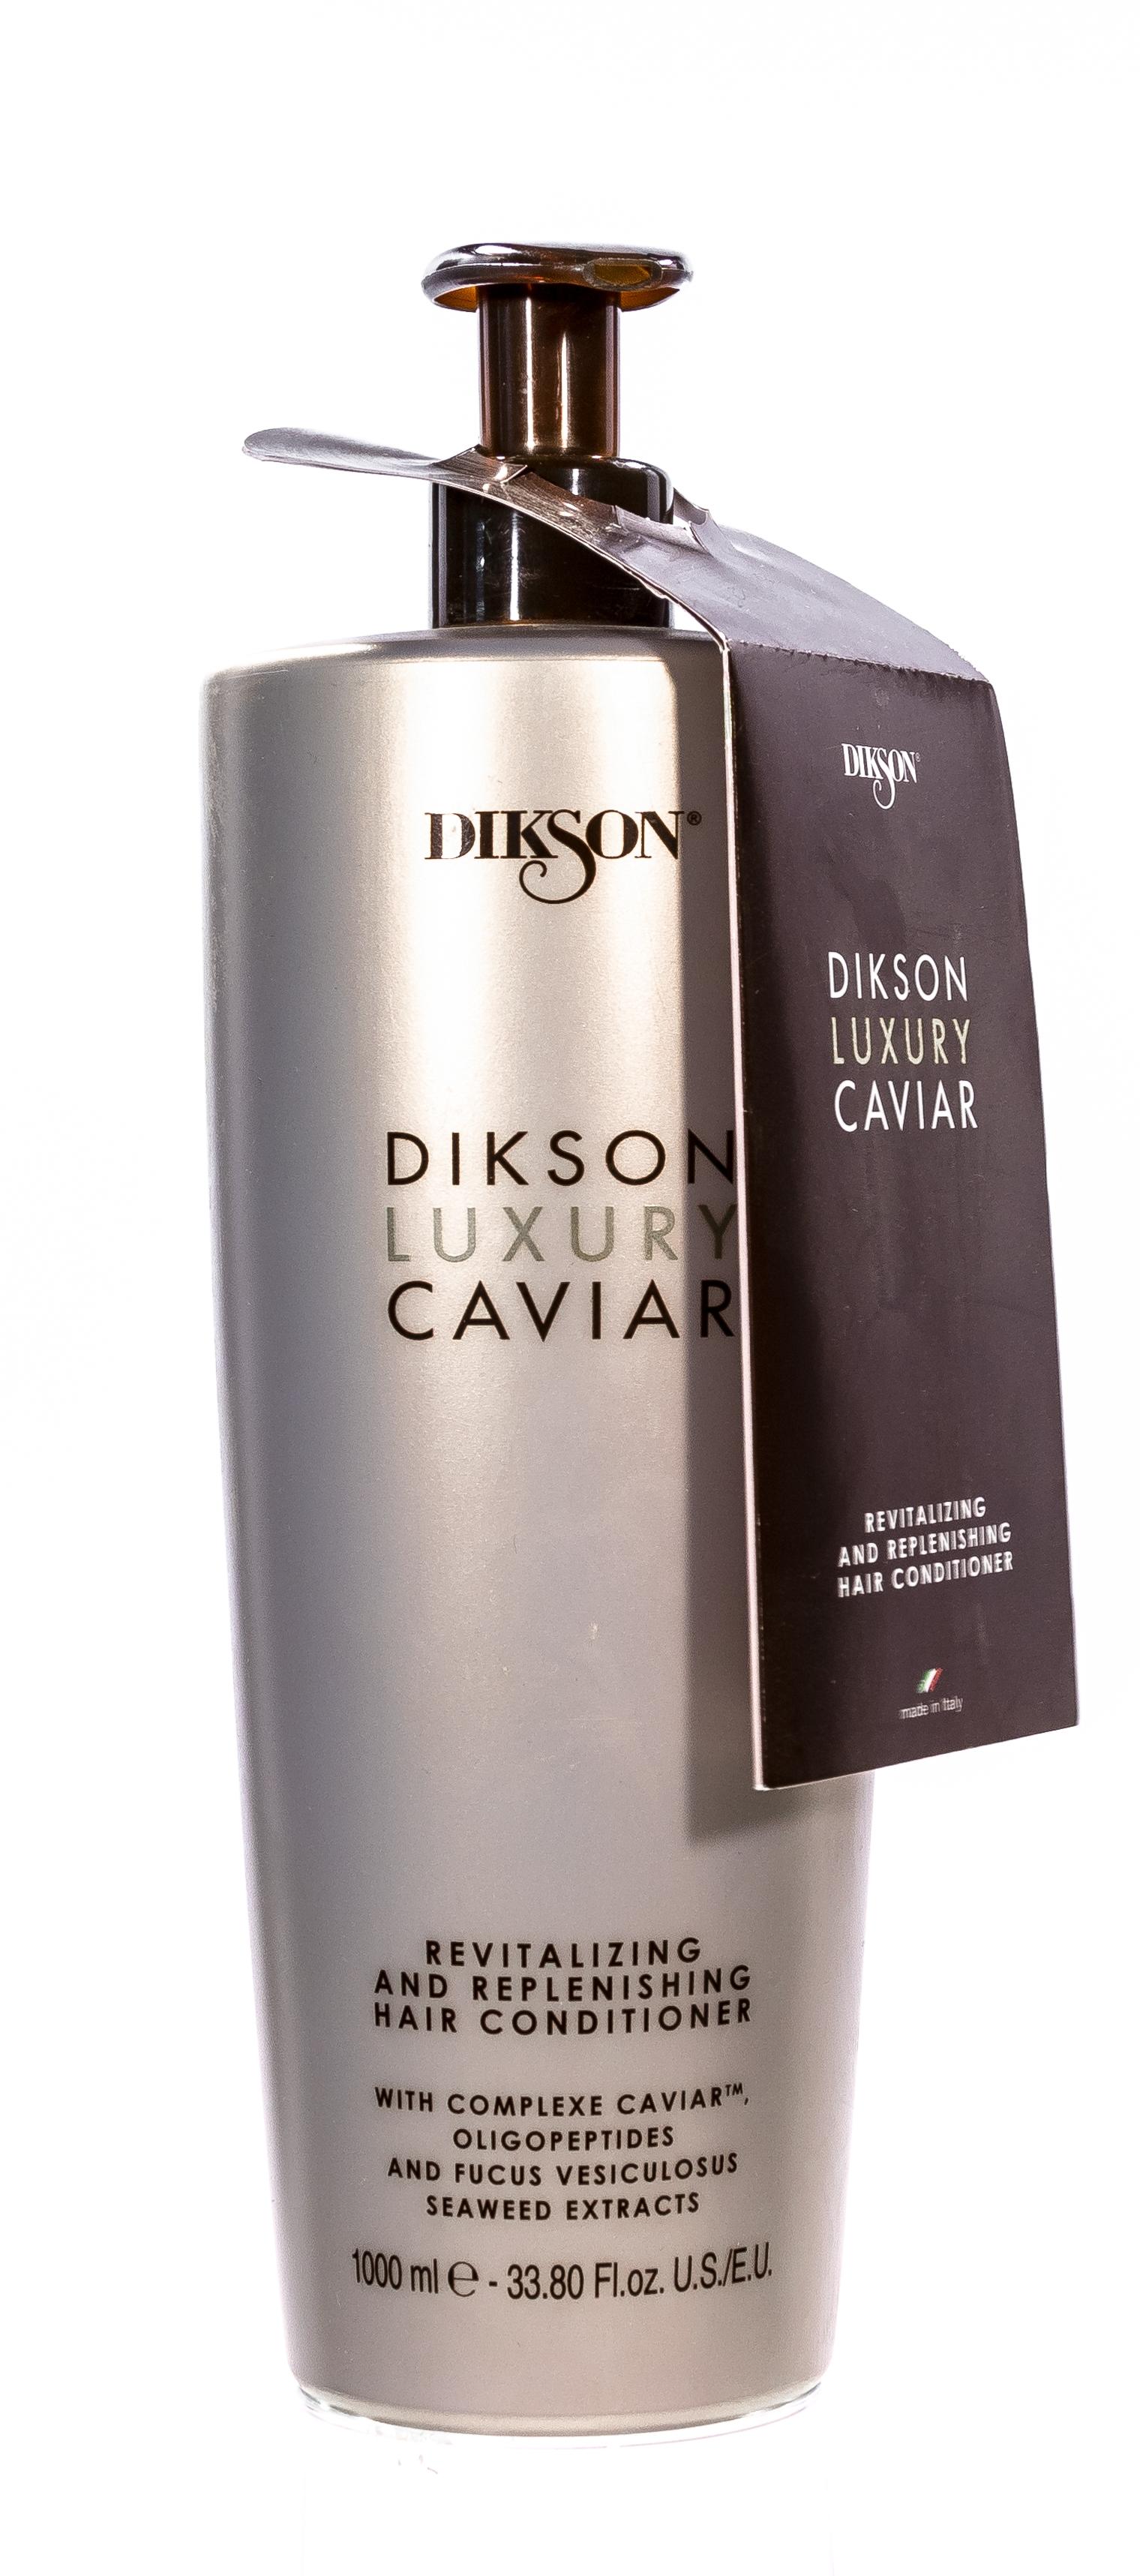 Dikson Кондиционер Complexe Caviar Conditioner Ревитализирующий и Наполняющий, 1000 мл dikson кондиционер complexe caviar conditioner ревитализирующий и наполняющий 280 мл